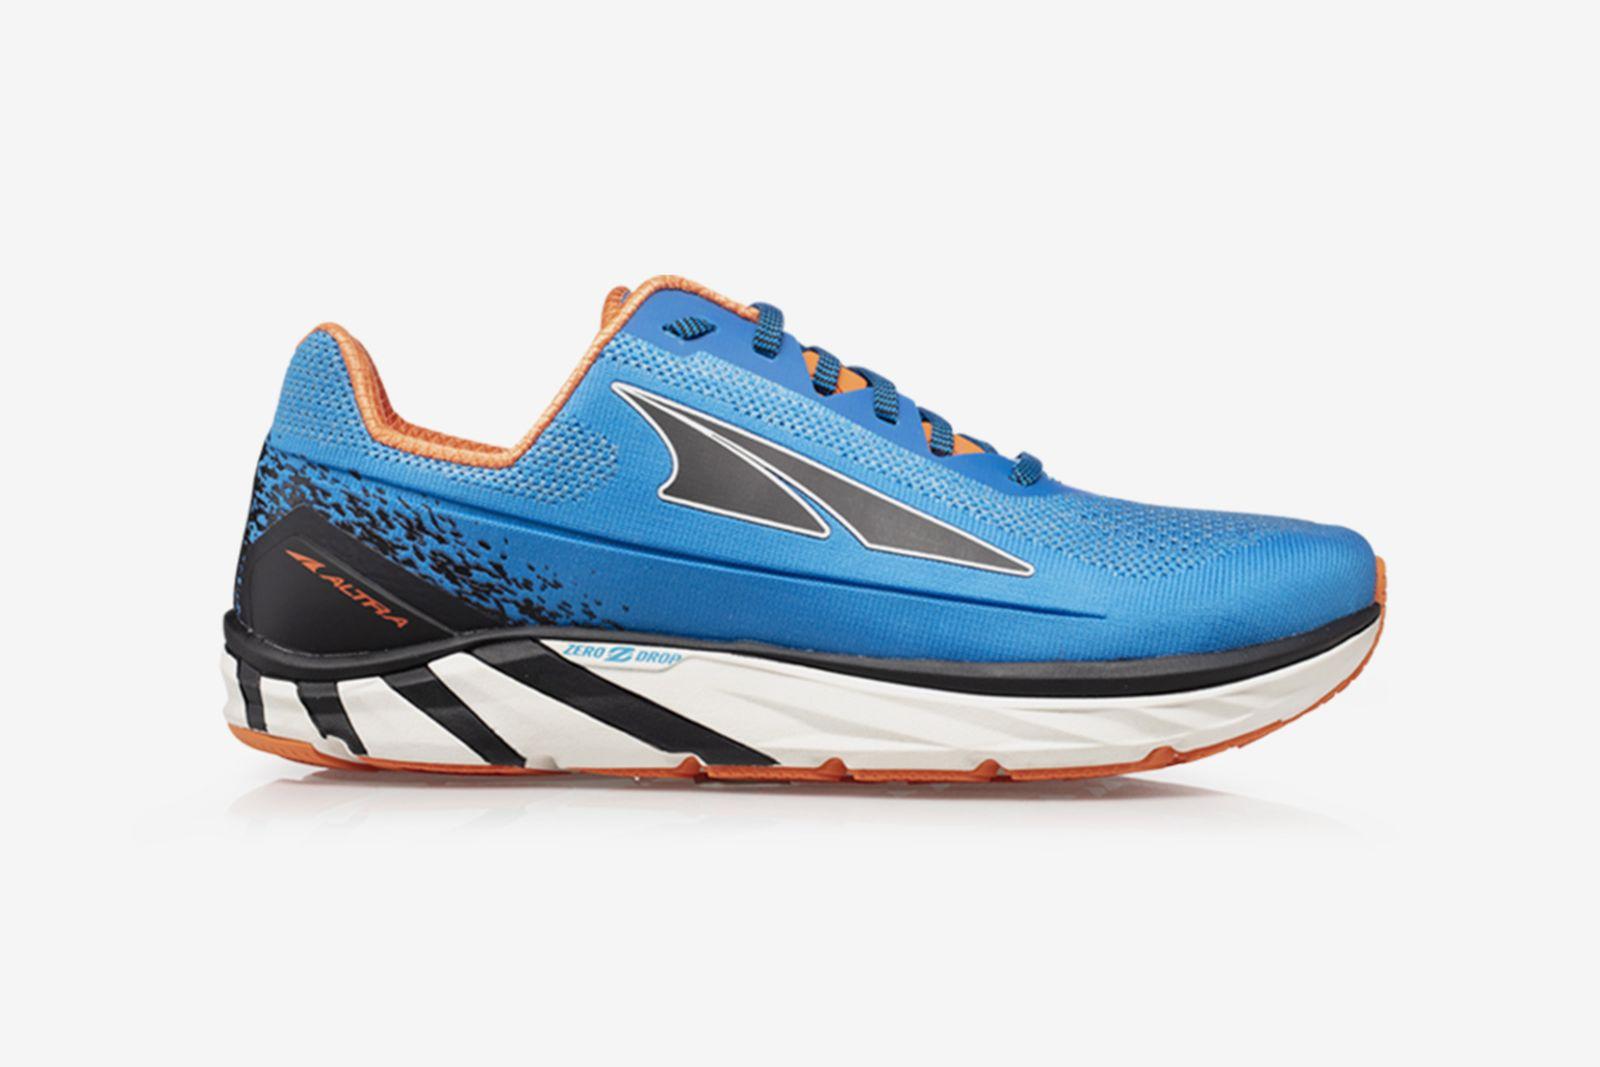 best-running-shoes-for-men-guide-altra-torin-plush